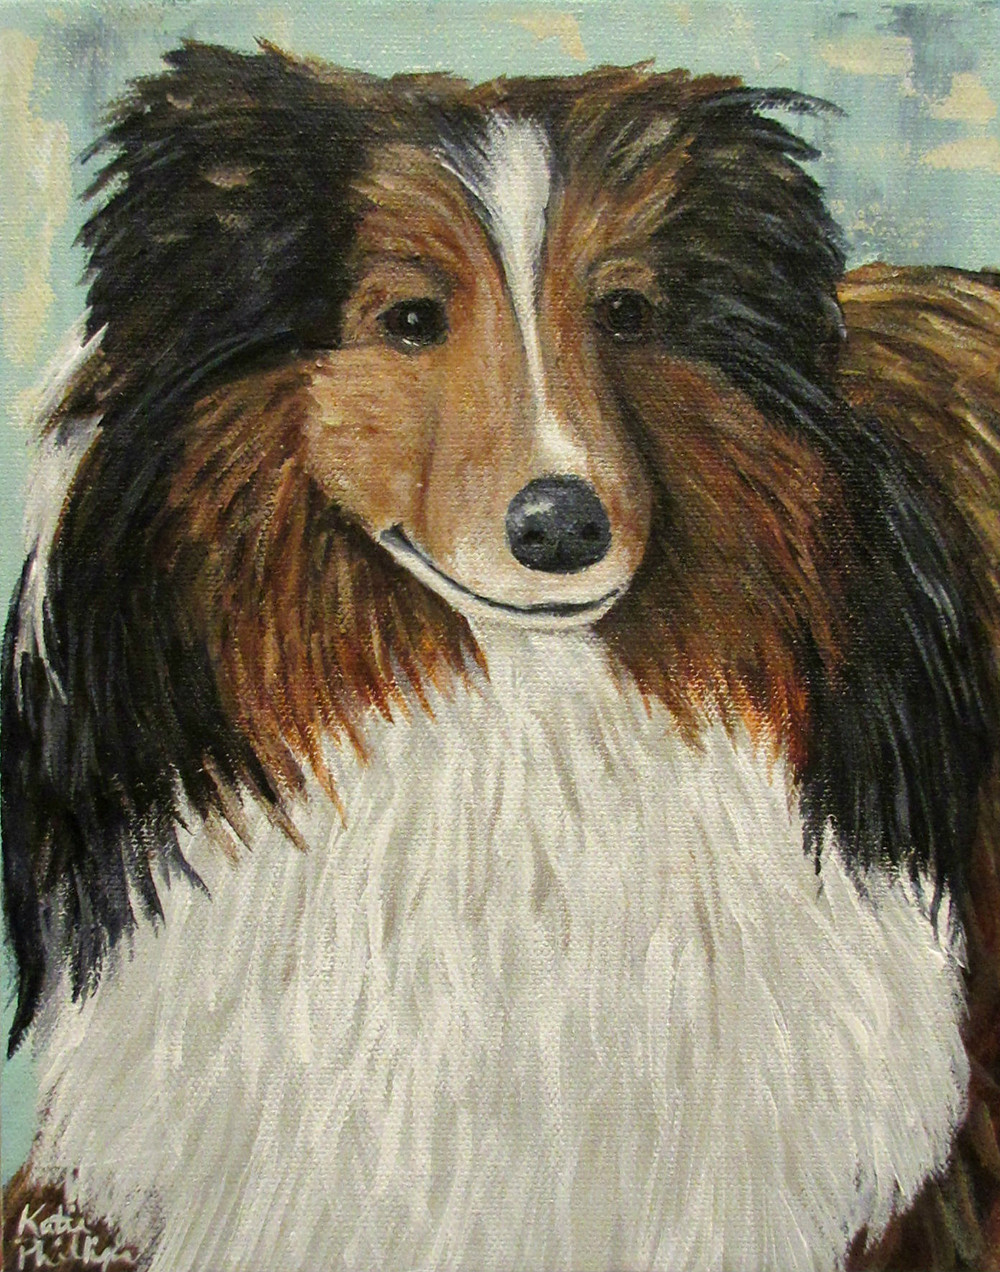 Pet portraits by Atlanta artist Katie Phillips